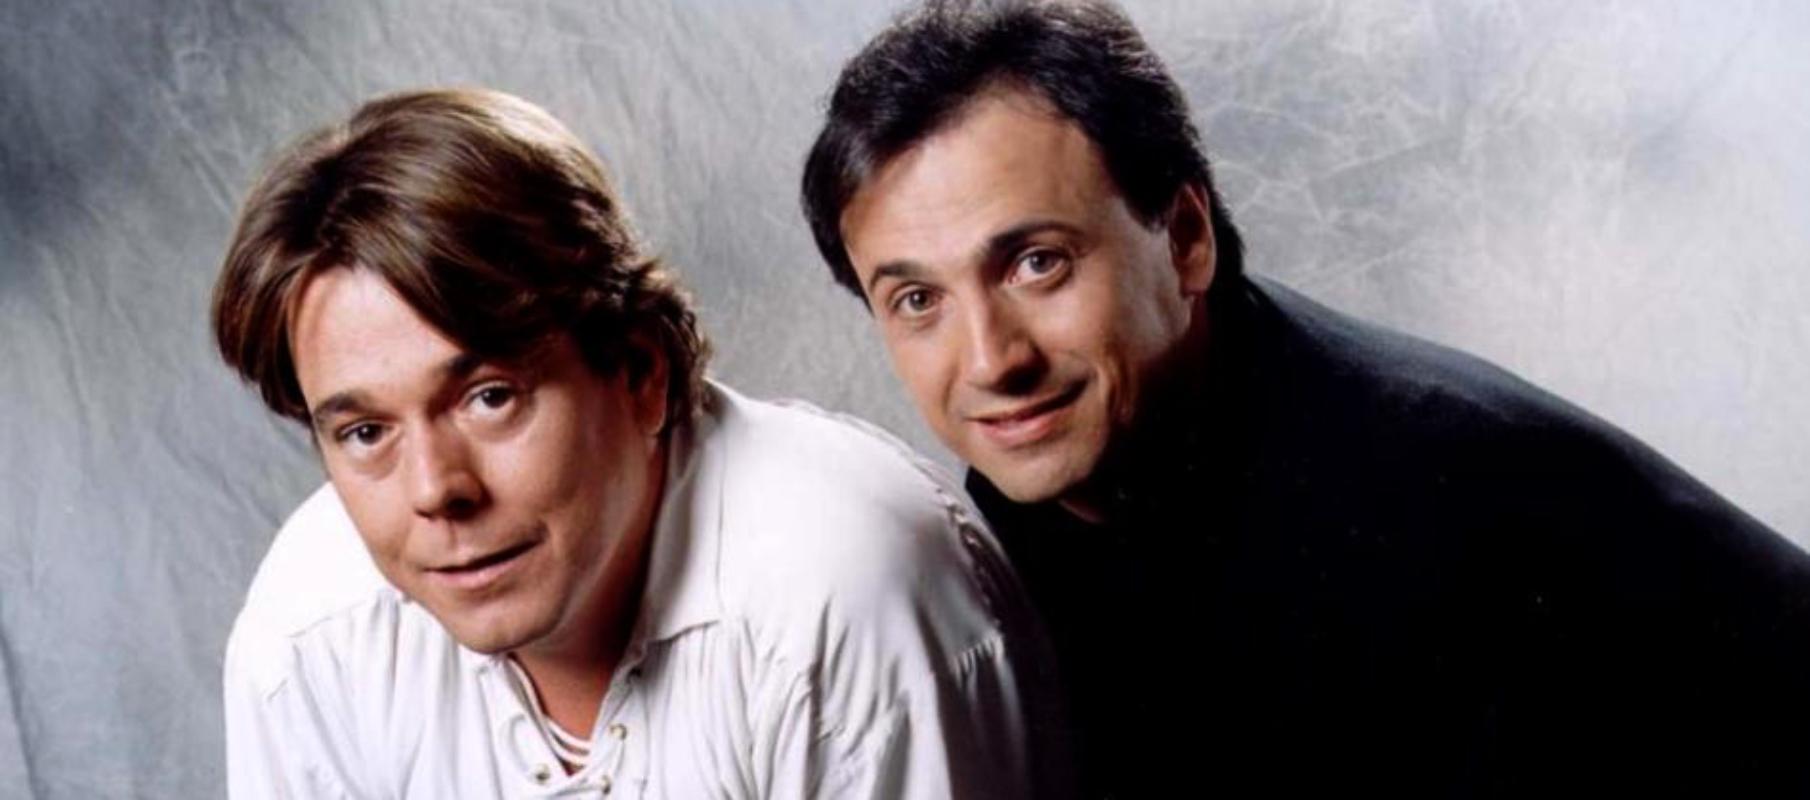 Juan Muñoz i José Mota, en ua promo de 'Cruz y Raya' / TVE